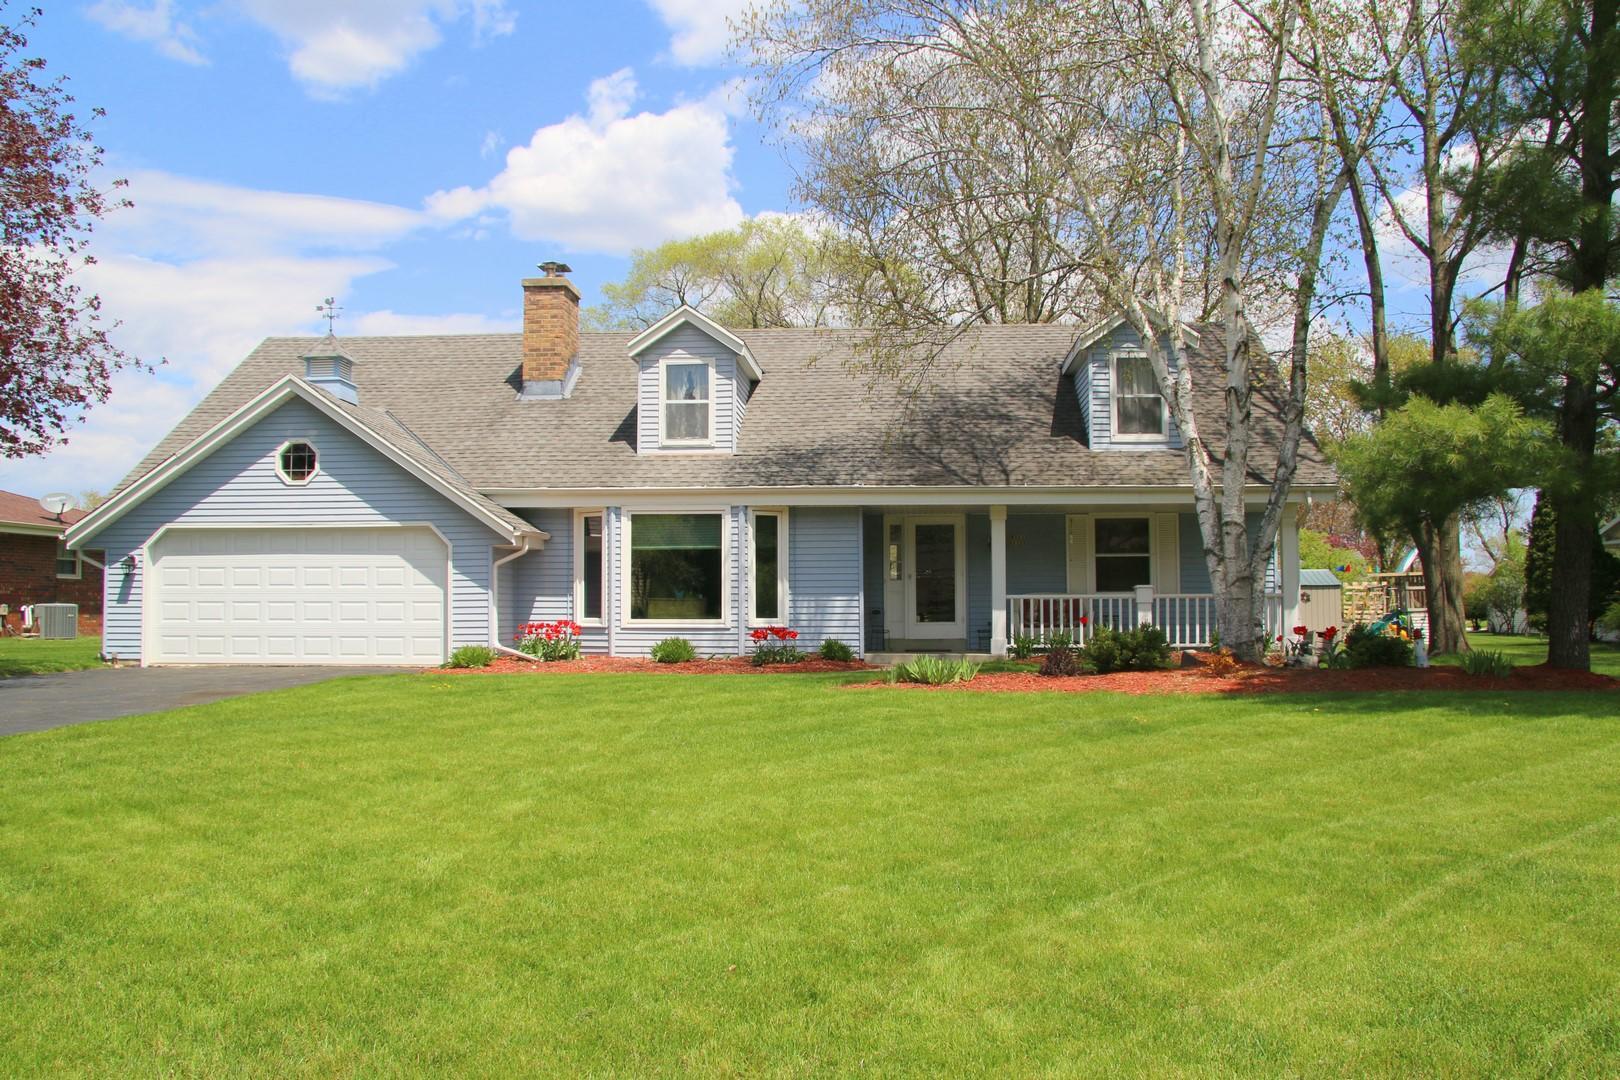 W223N2328 Meadowood Ln, Pewaukee, Wisconsin 53186, 4 Bedrooms Bedrooms, 9 Rooms Rooms,2 BathroomsBathrooms,Single-Family,For Sale,Meadowood Ln,1637326